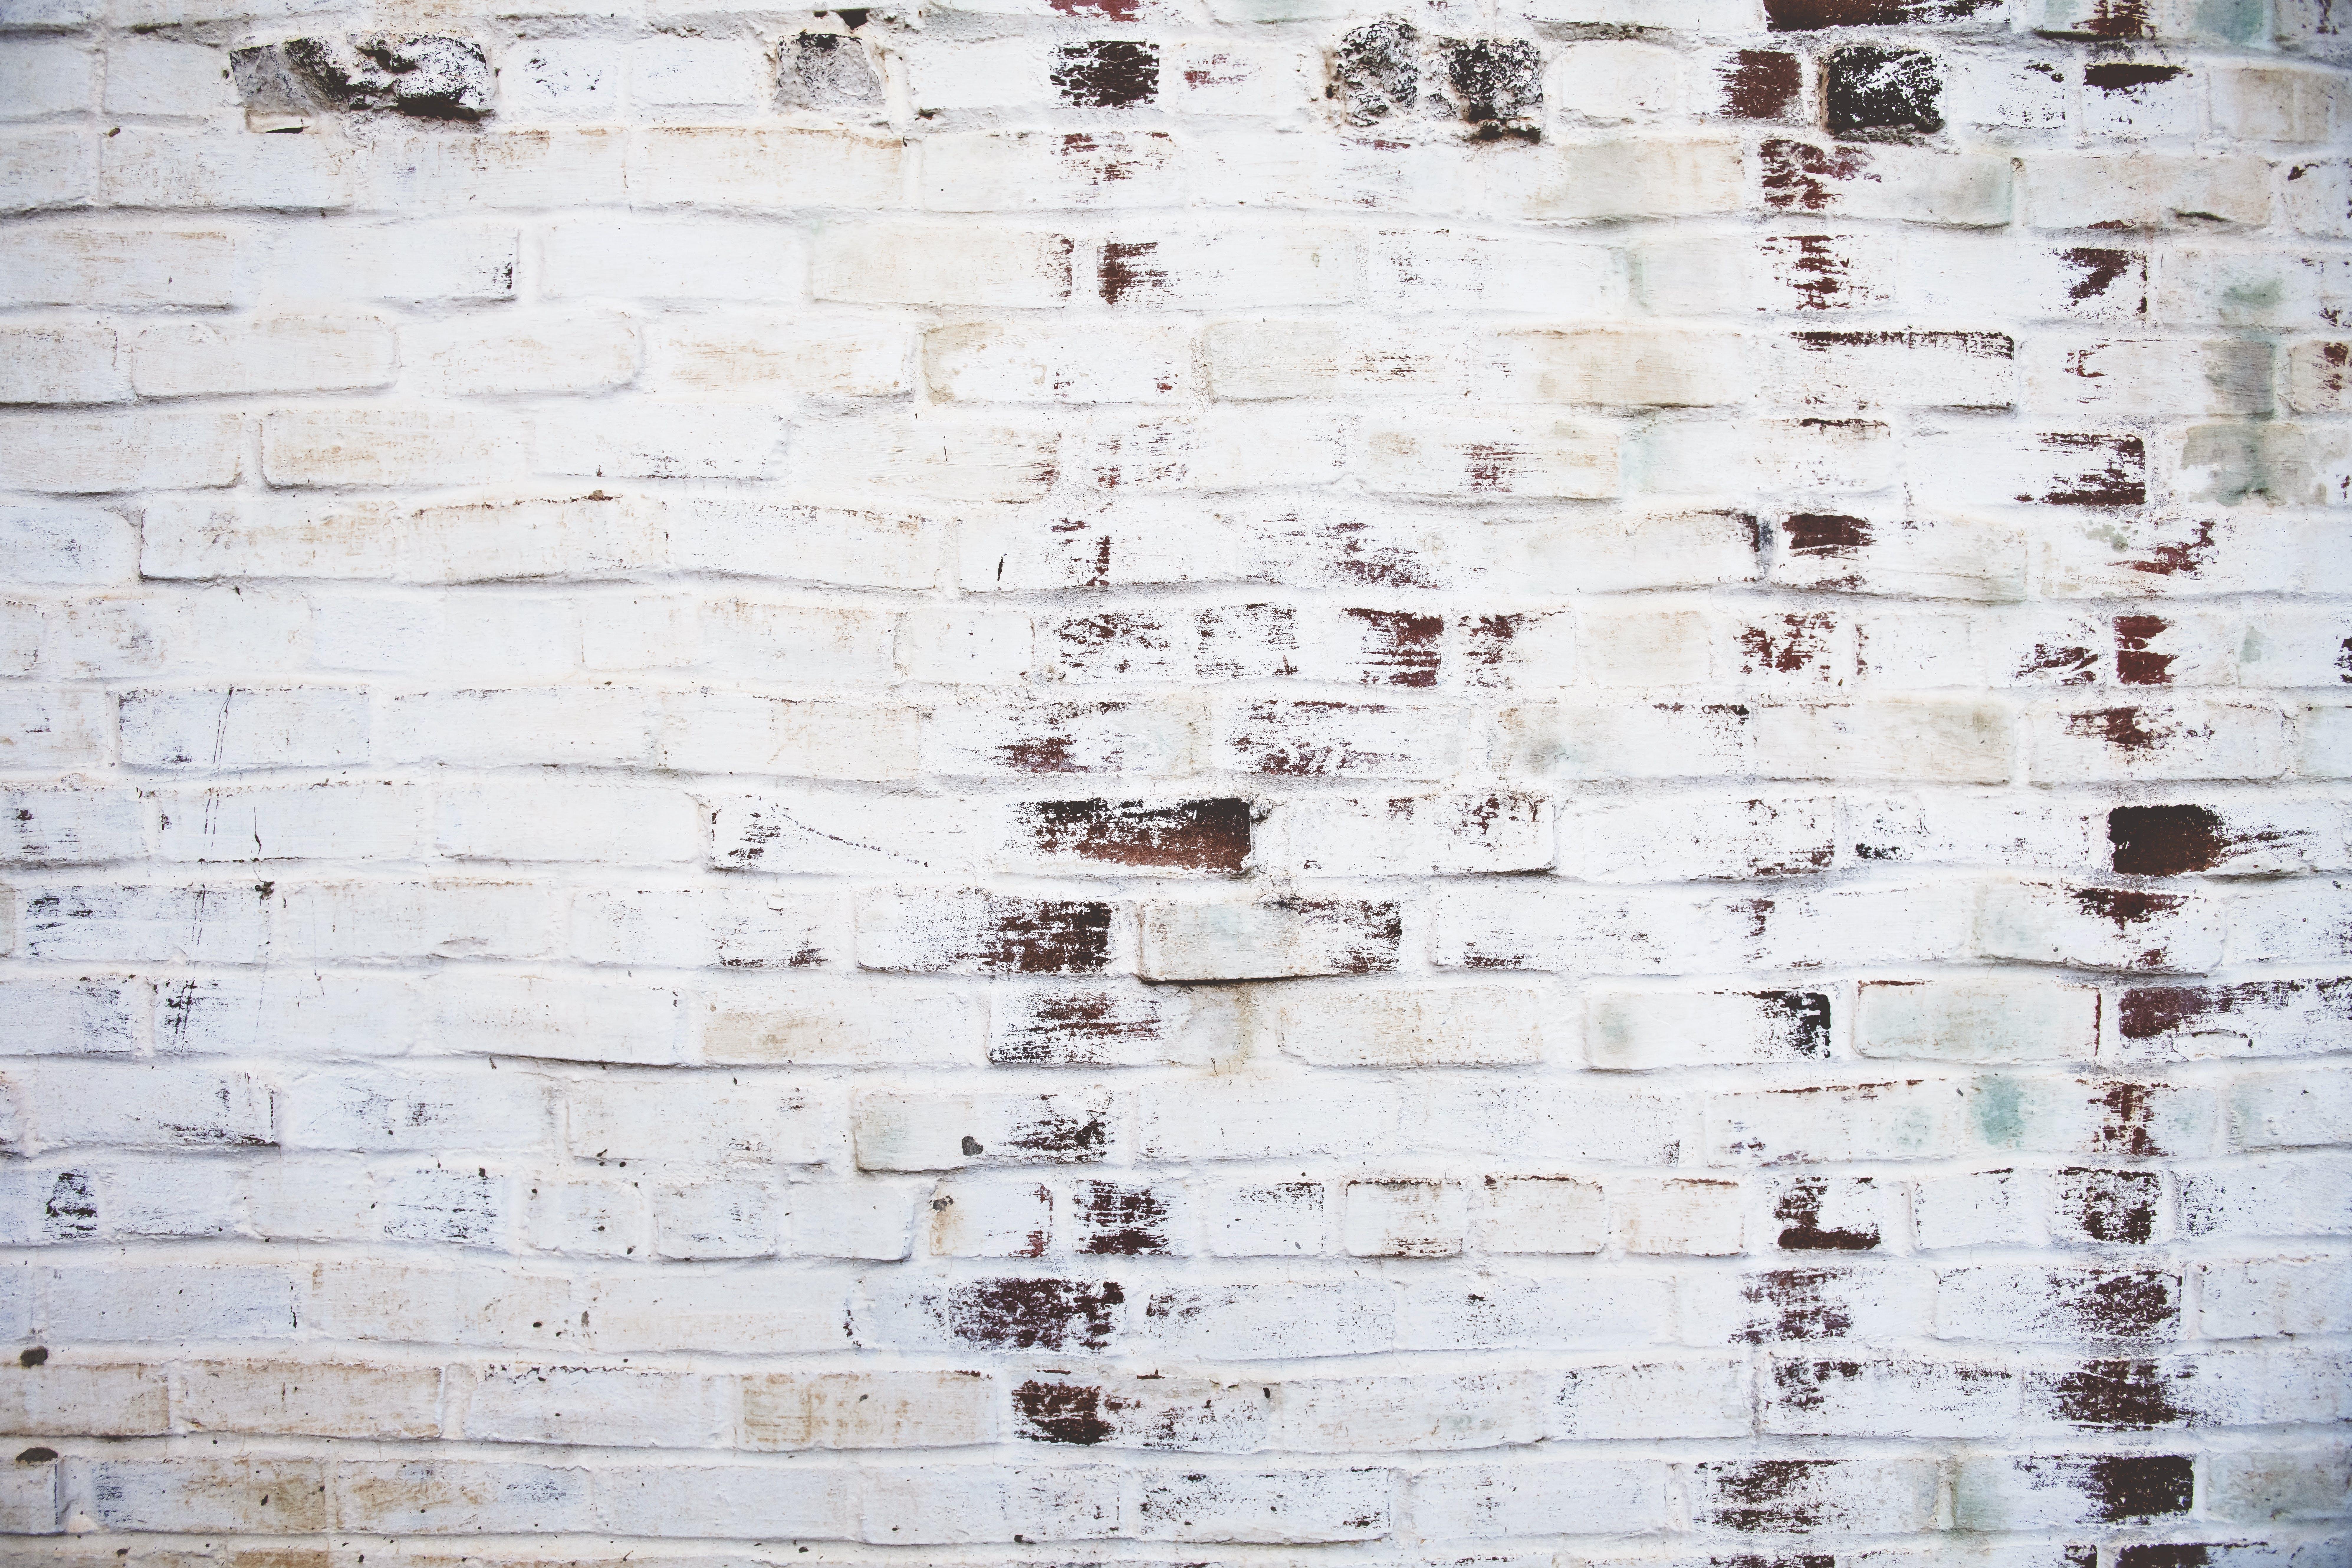 beskidt, mursten, murstensvæg